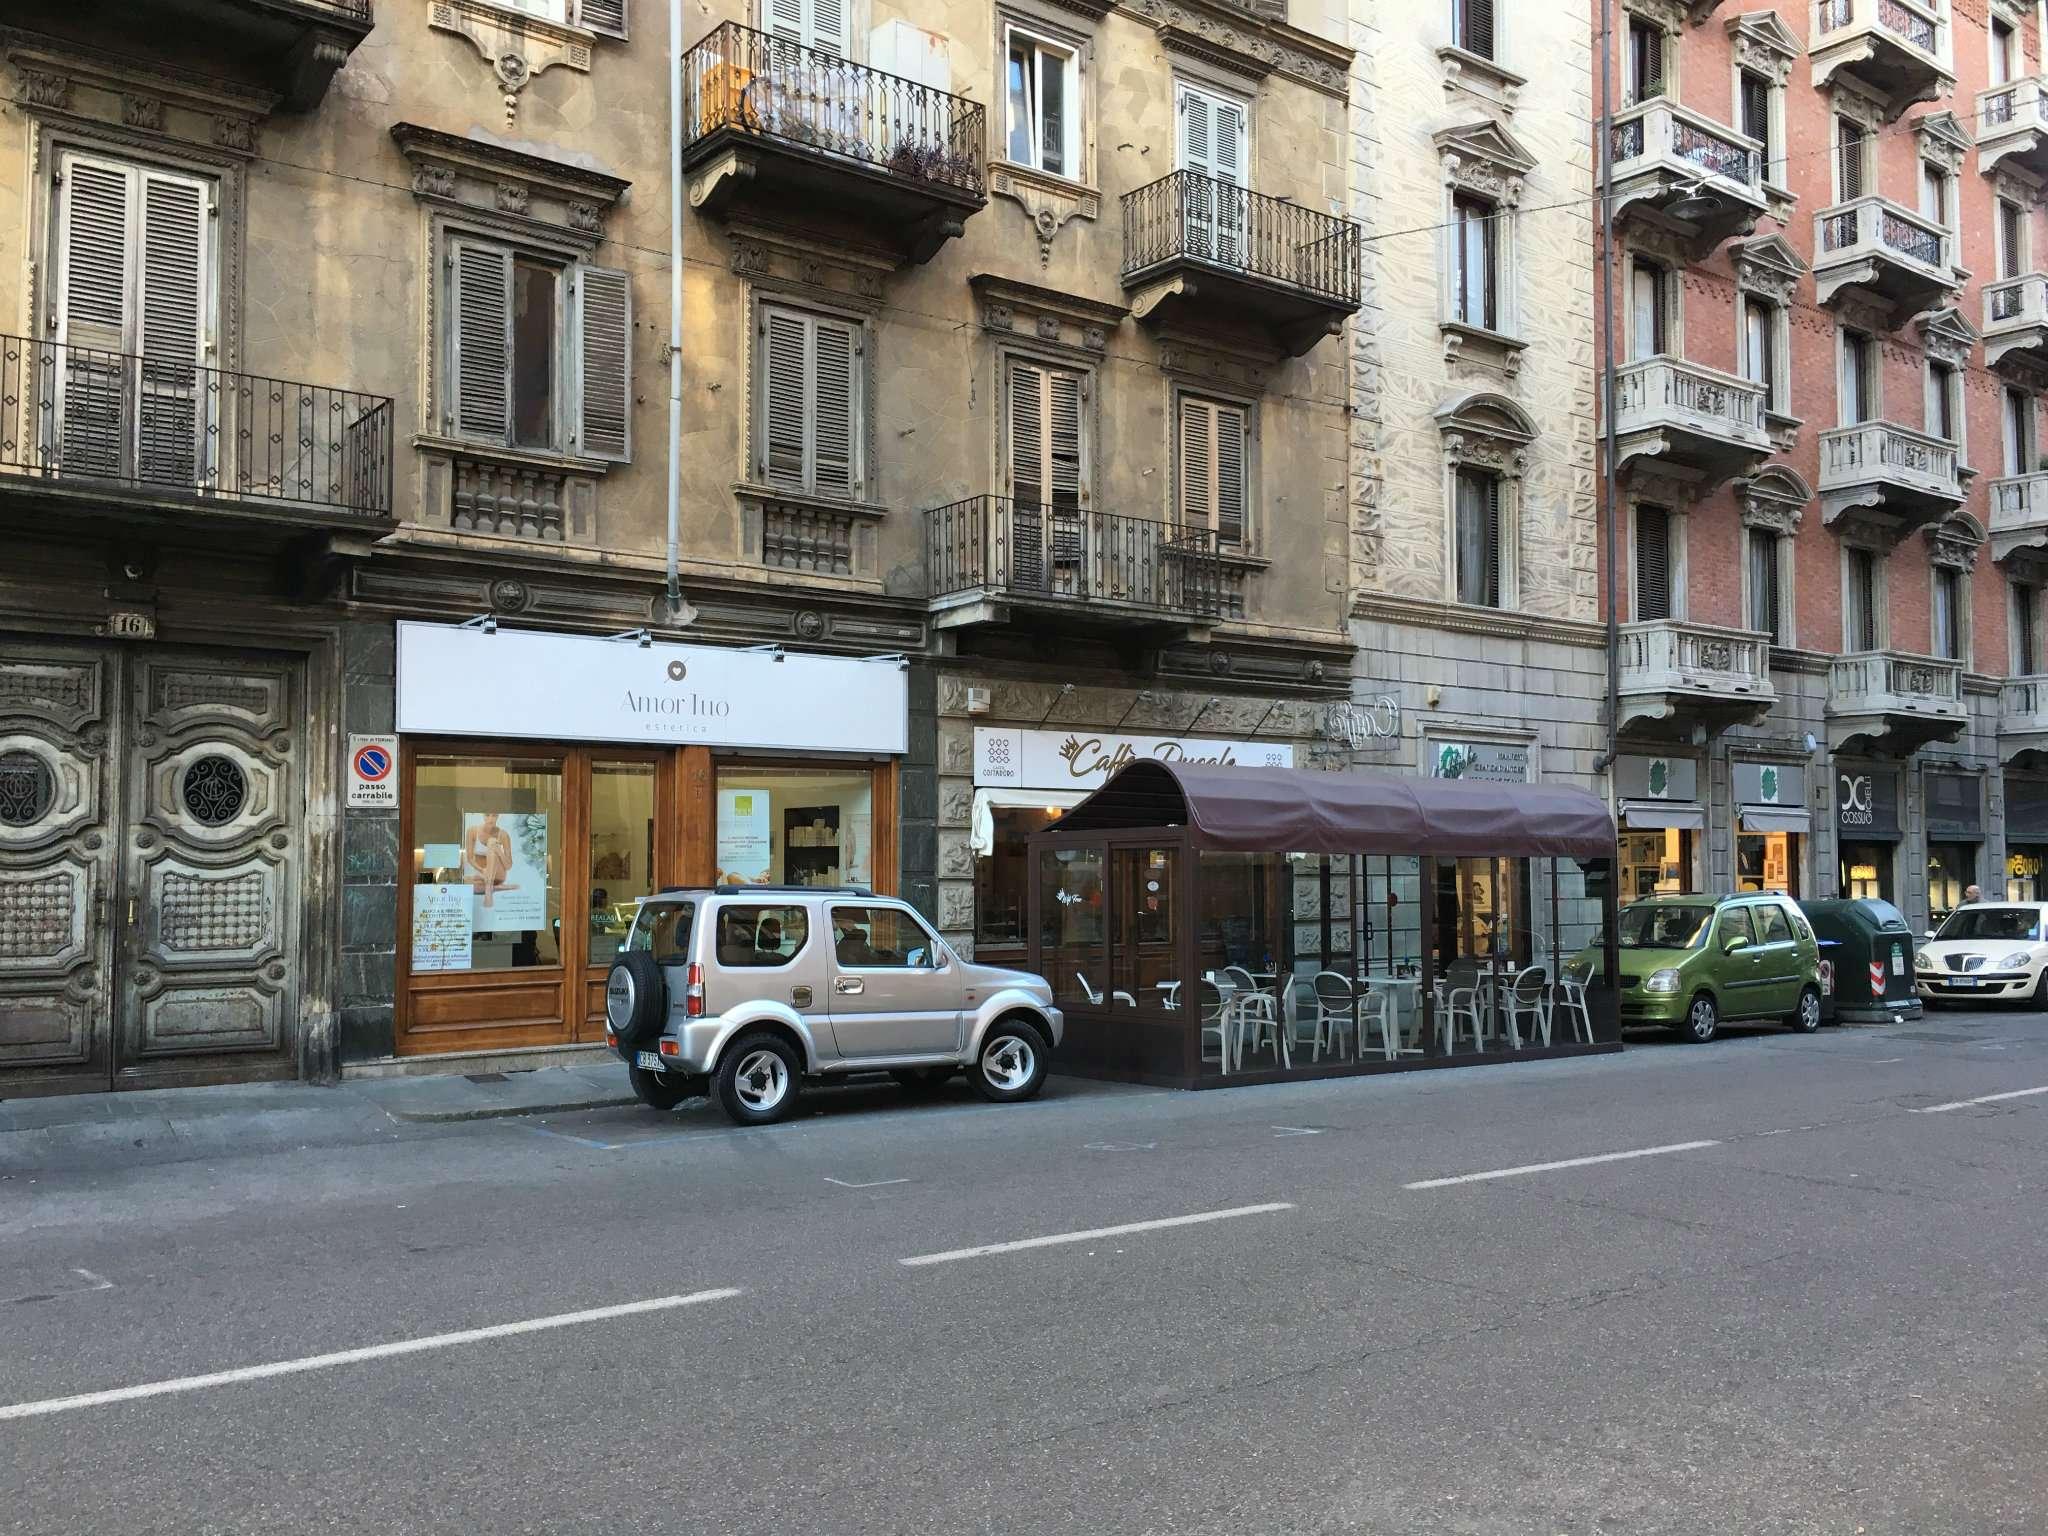 Negozio in vendita Zona Cit Turin, San Donato, Campidoglio - via Duchessa Jolanda 16 Torino